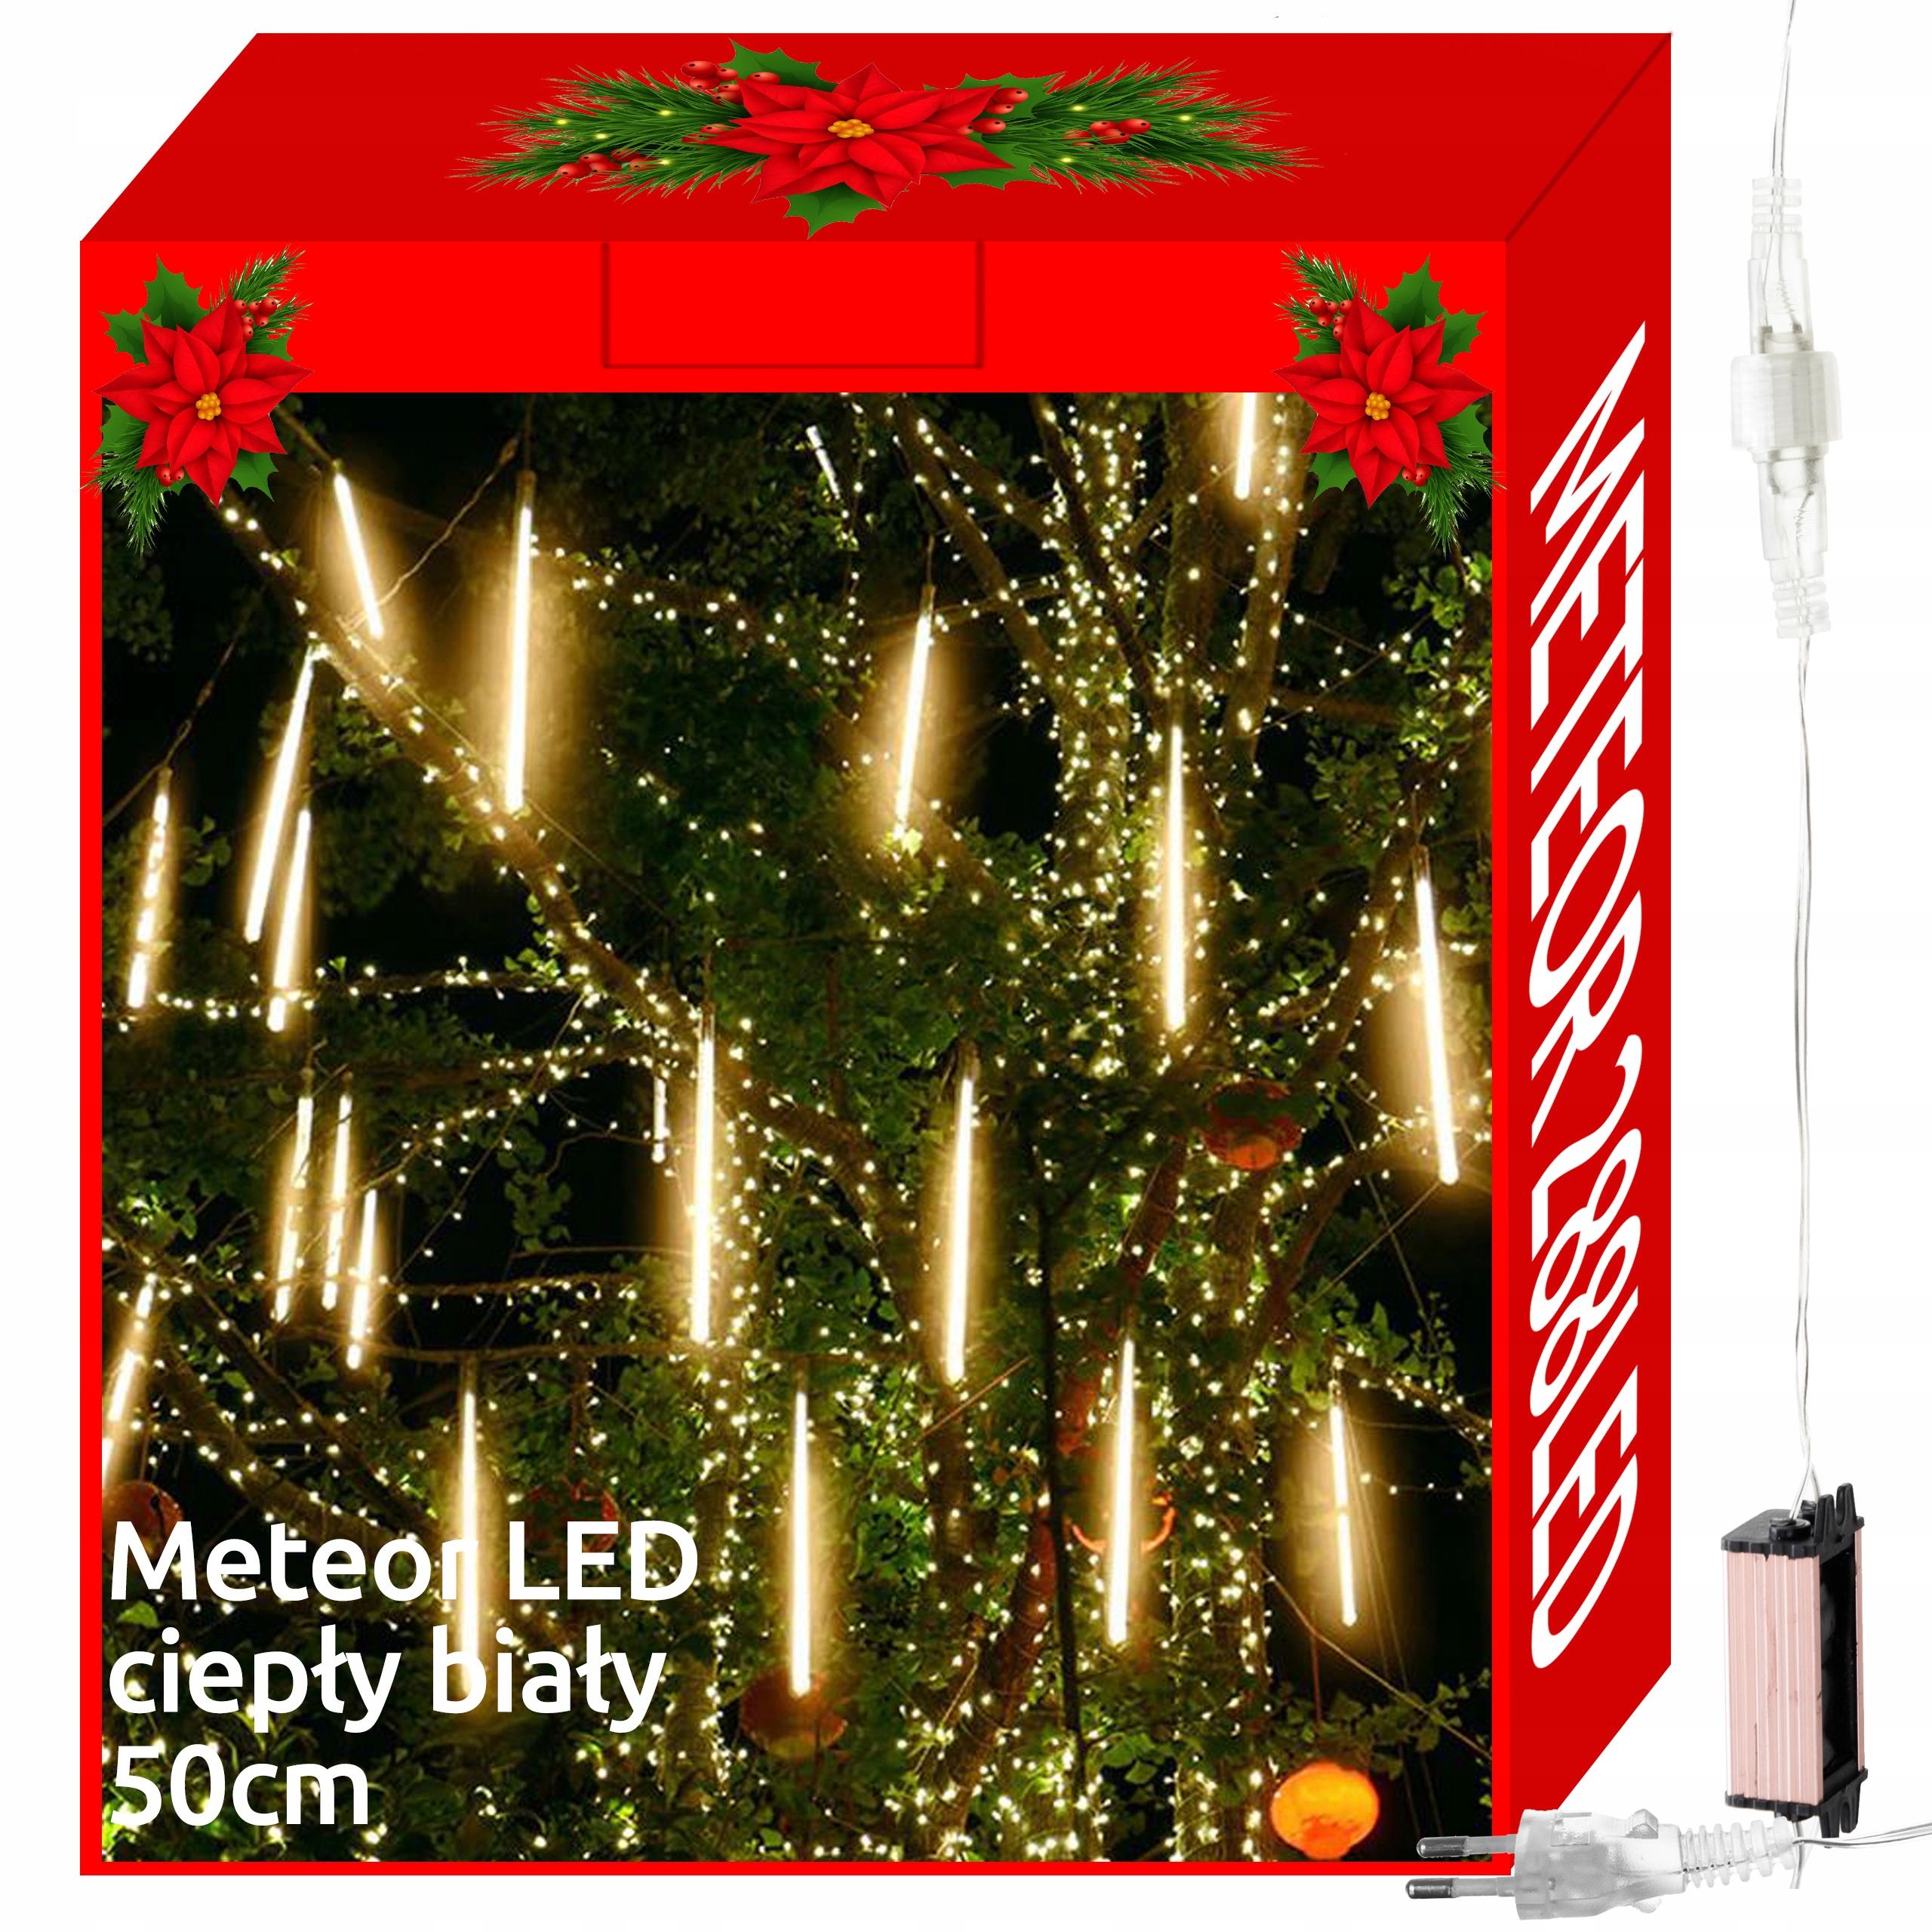 Sople Meteory Lampki Padający Śnieg 288 LED 50cm c